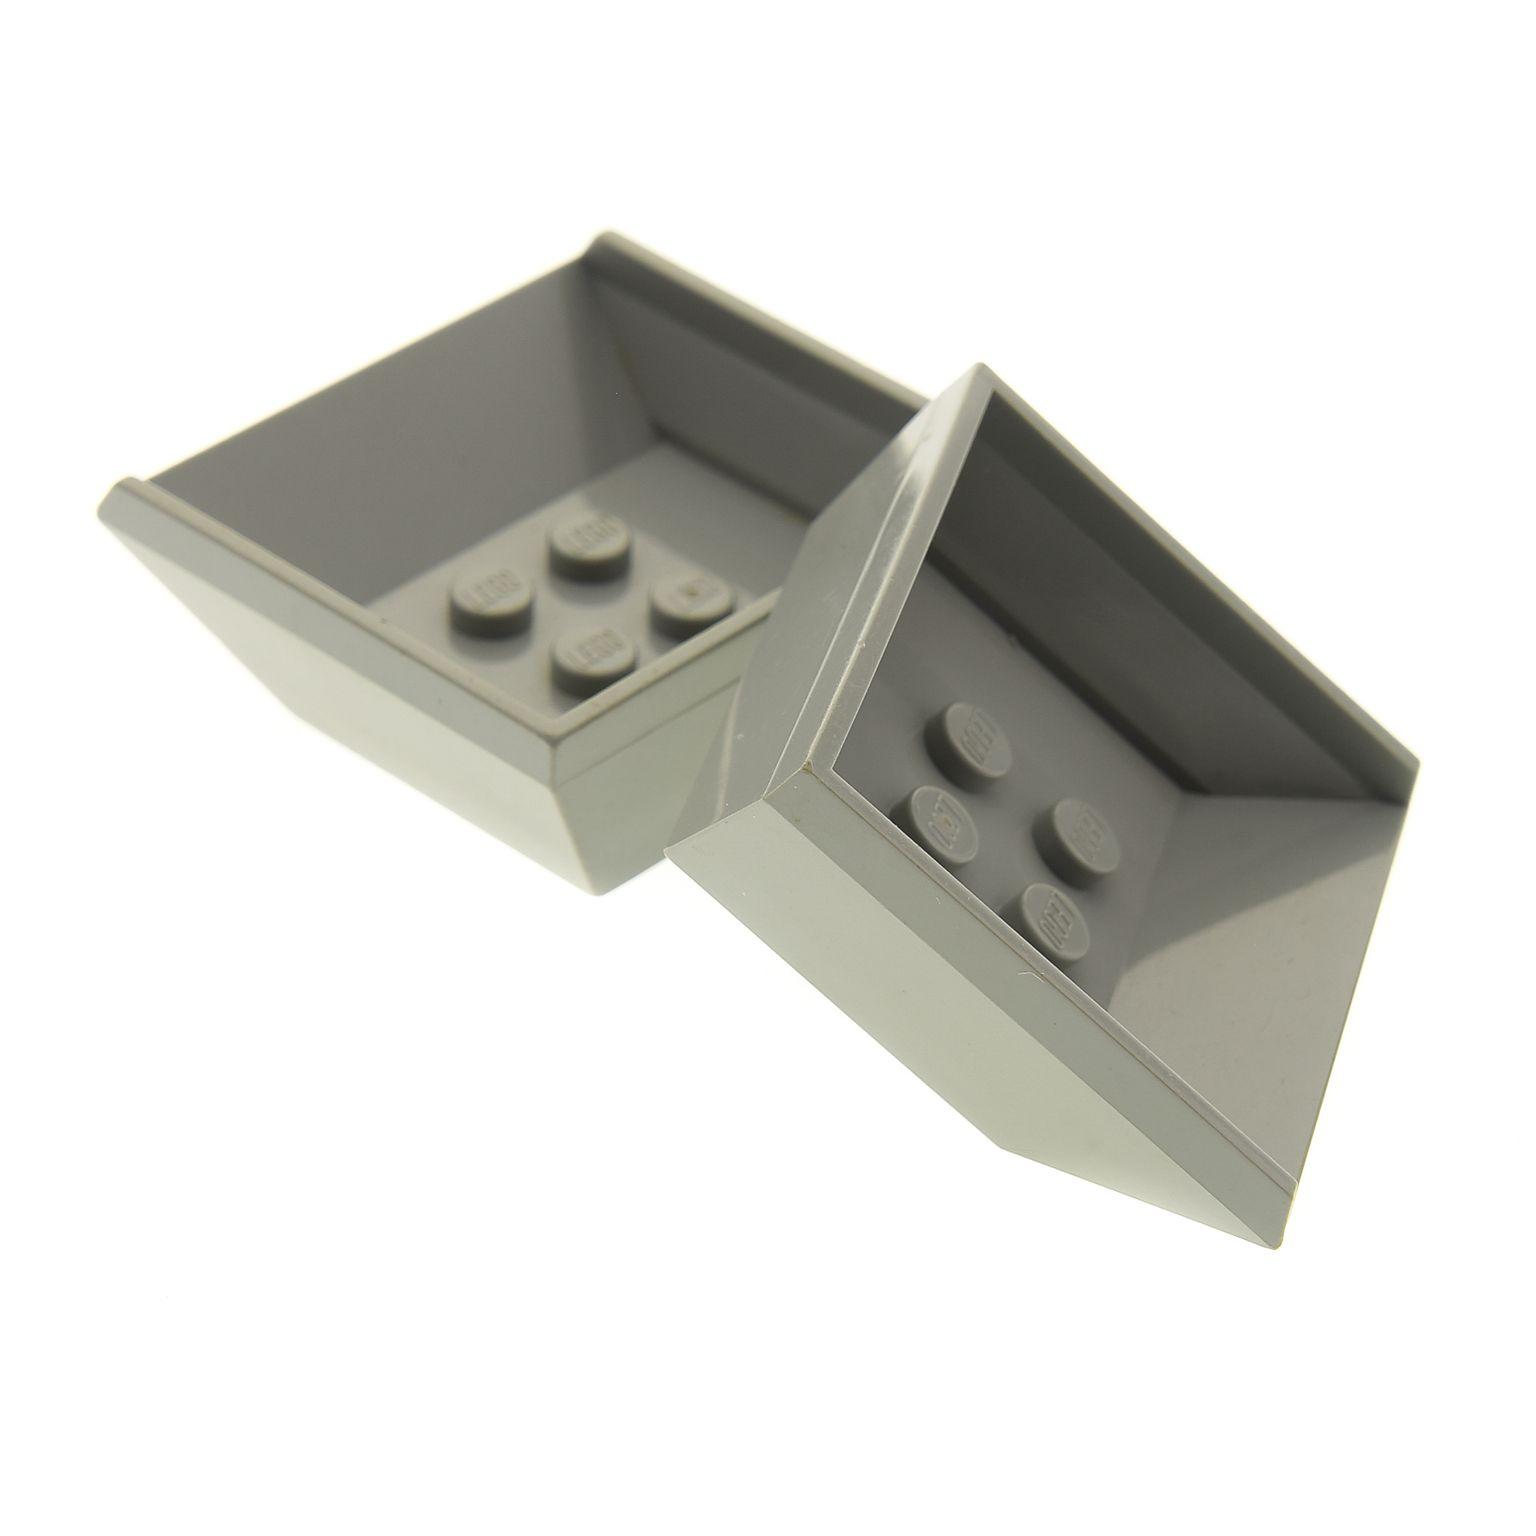 2 x lego system kipper auflage alt hell grau 4x6. Black Bedroom Furniture Sets. Home Design Ideas